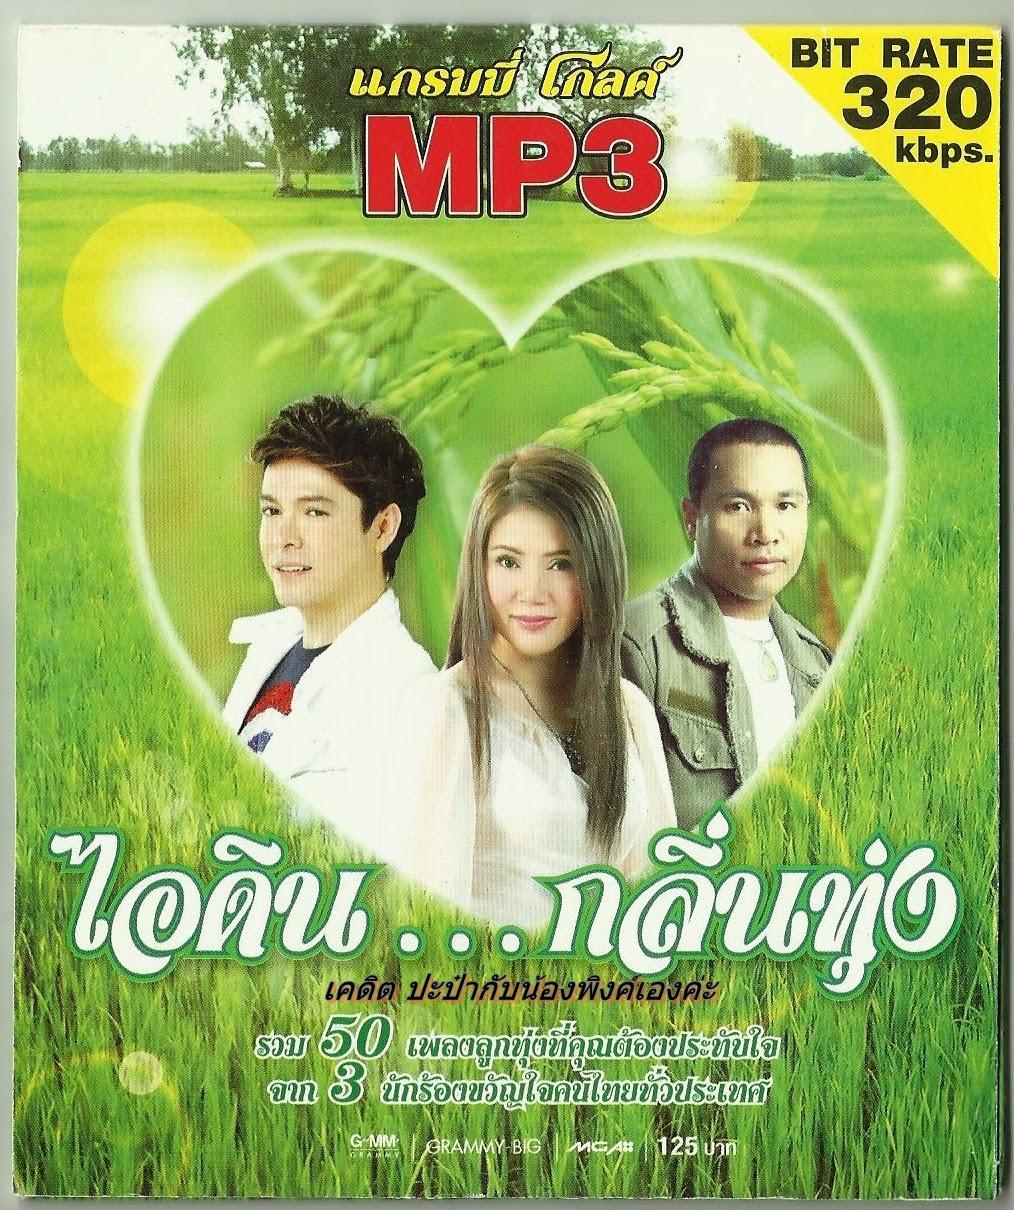 Download [Mp3]-แกรมมี่ โกลด์ MP3 ไอดิน…กลิ่นทุ่ง ของ รวมศิลปิน (@320kbps) [Shared] 4shared By Pleng-mun.com